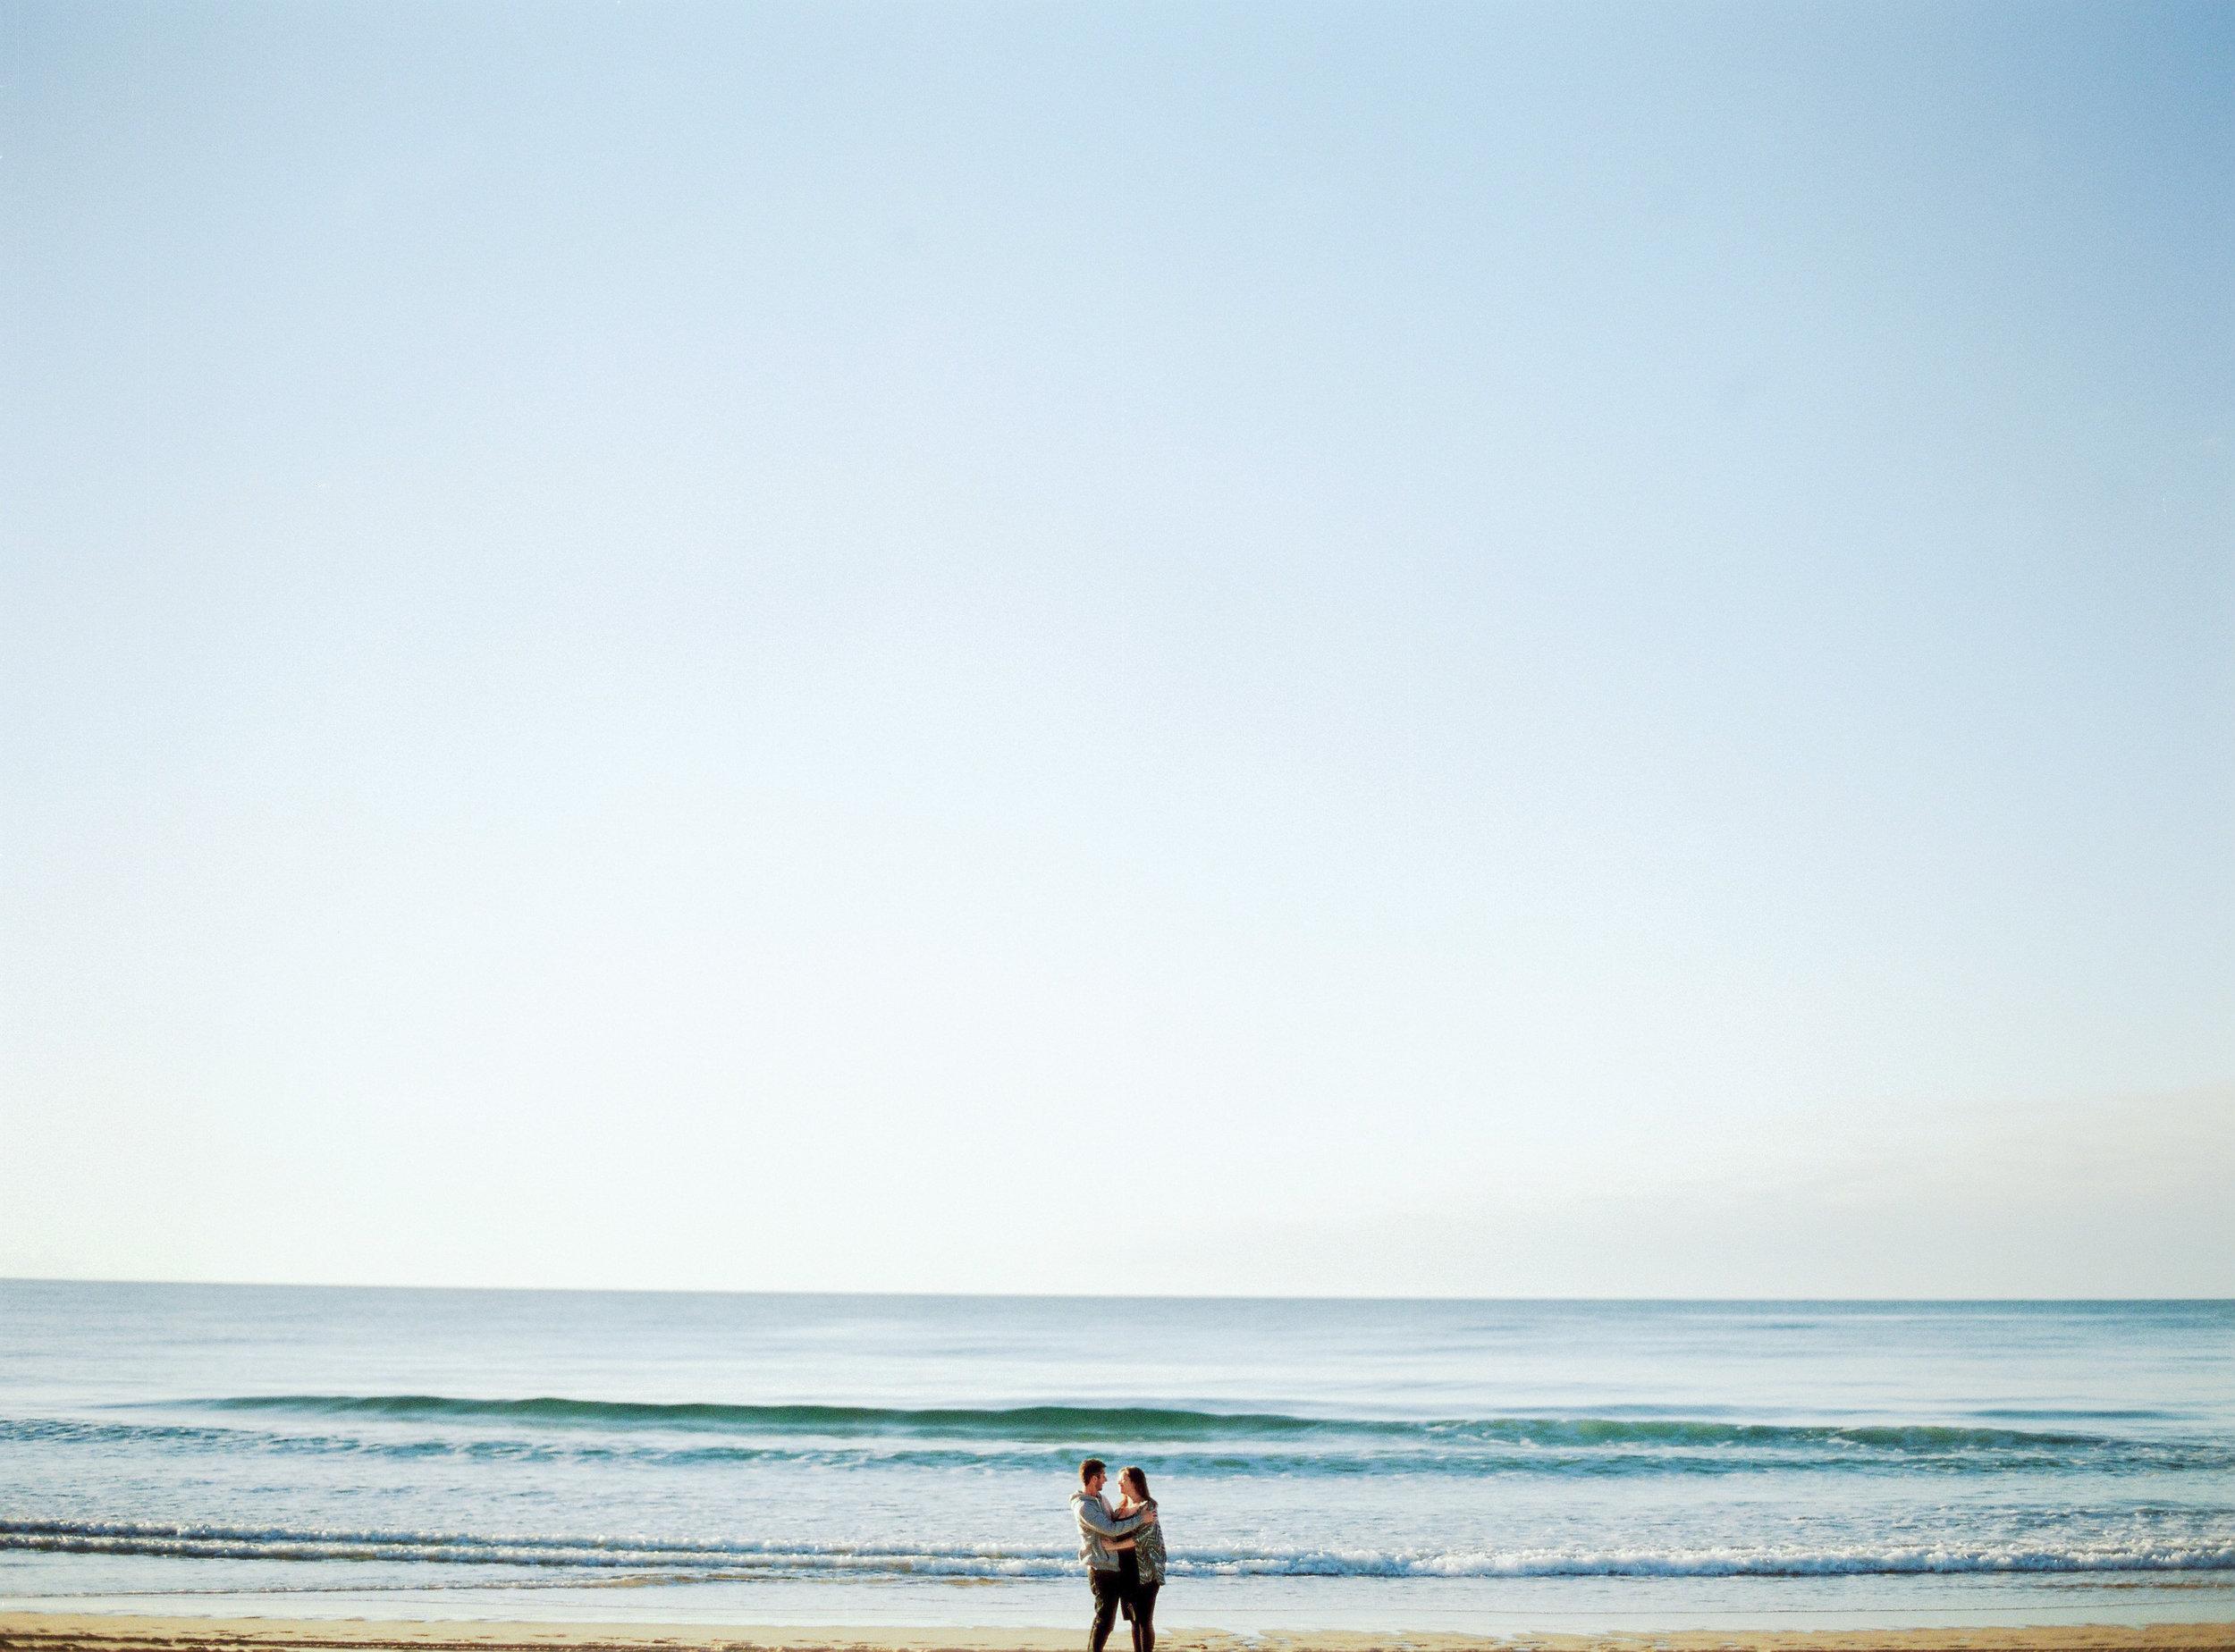 ccelinehamelin-photographe-couple-landes-session-plage-lovers-photography-photographe-seignosse-argentique-onfilm1.jpg